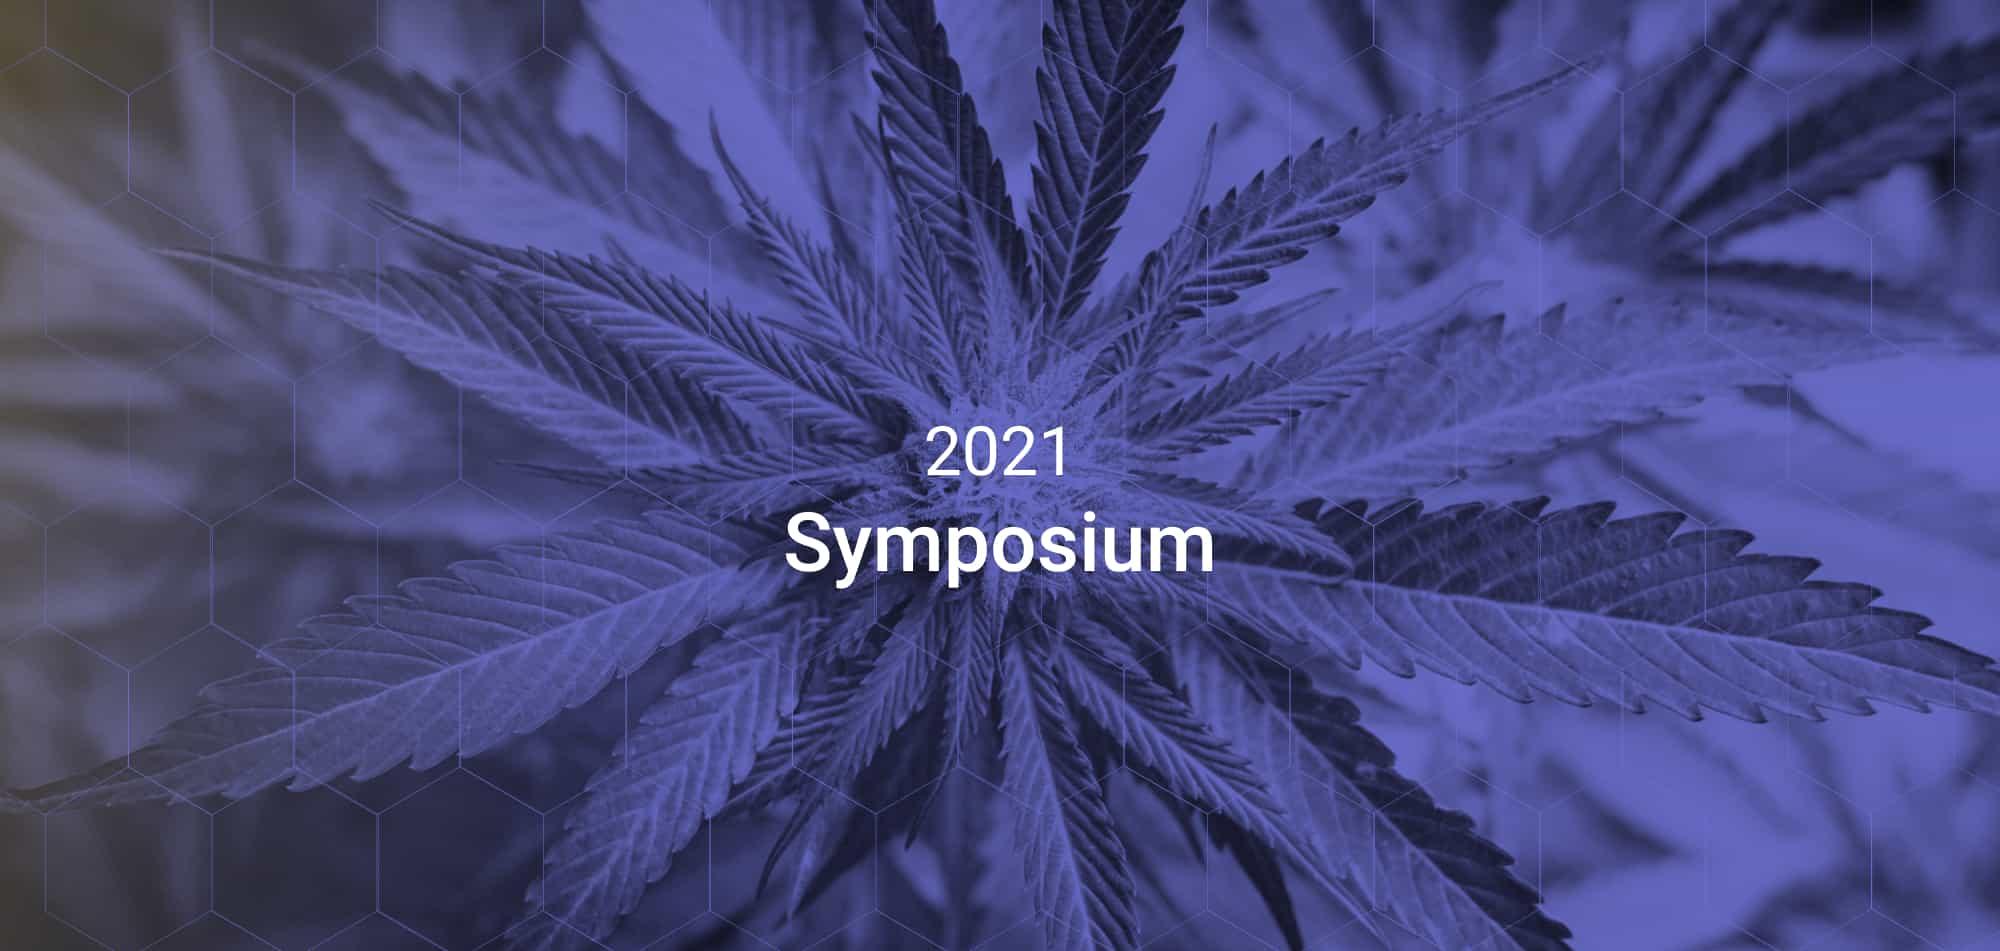 United in Compassion Australian Medicinal Cannabis Symposium